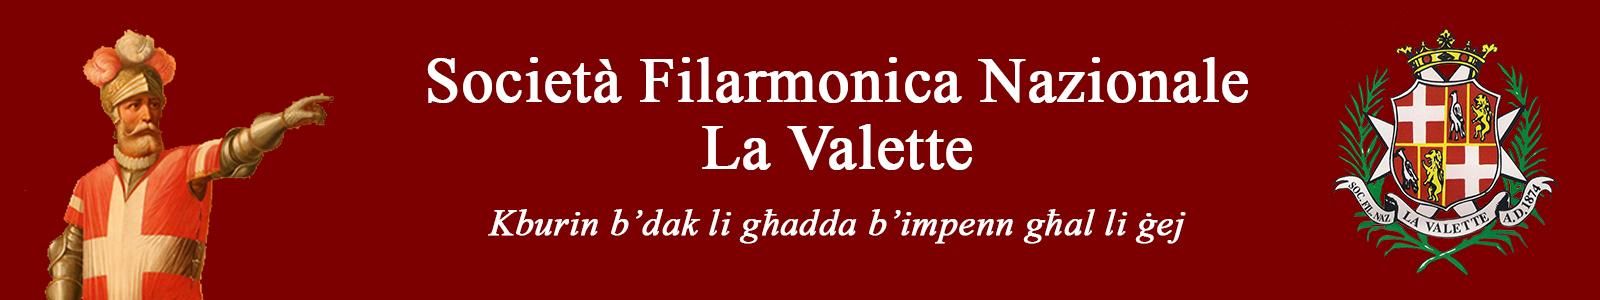 Societa Filarmonica Nazionale La Valette